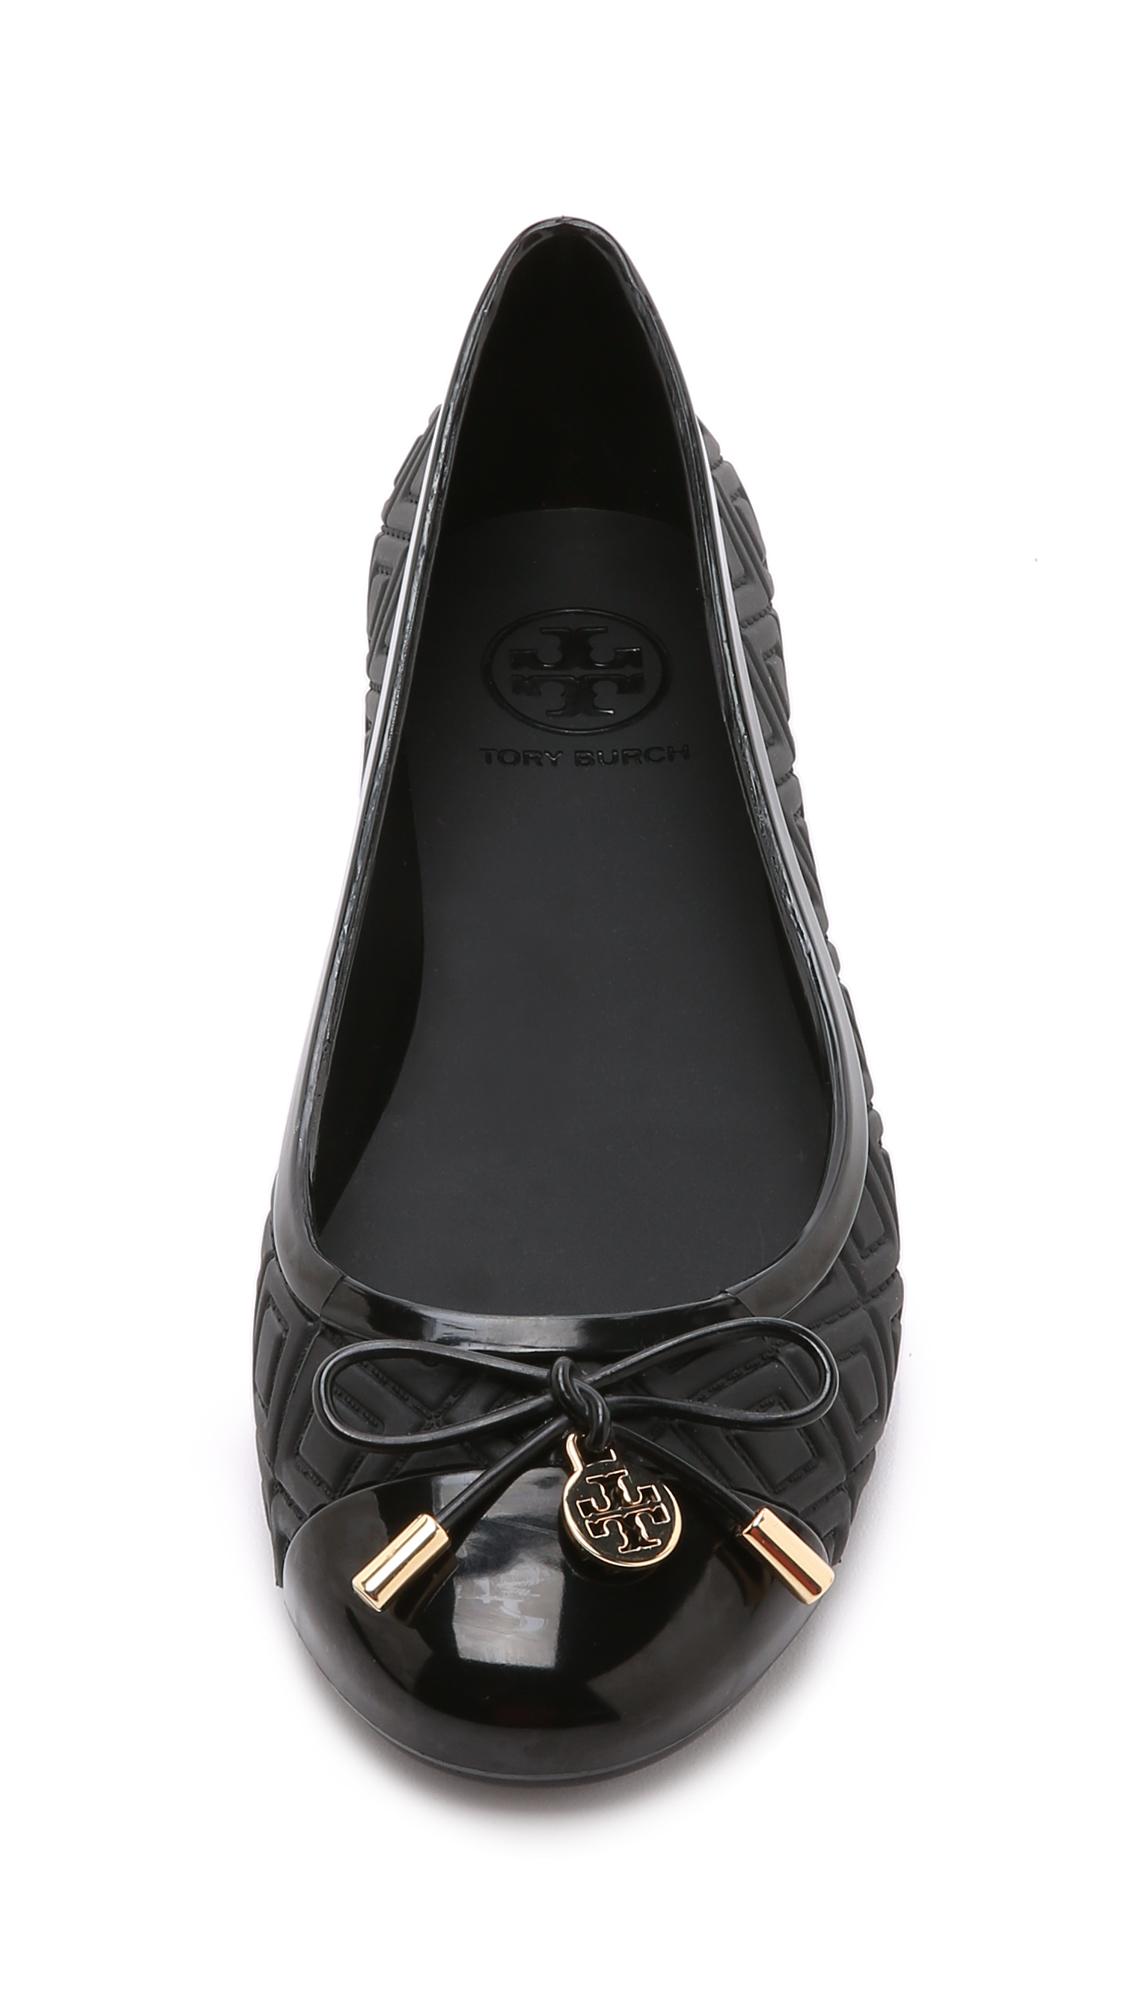 540d058e20ab5d Lyst - Tory Burch Jelly Ballet Flats - Black in Black